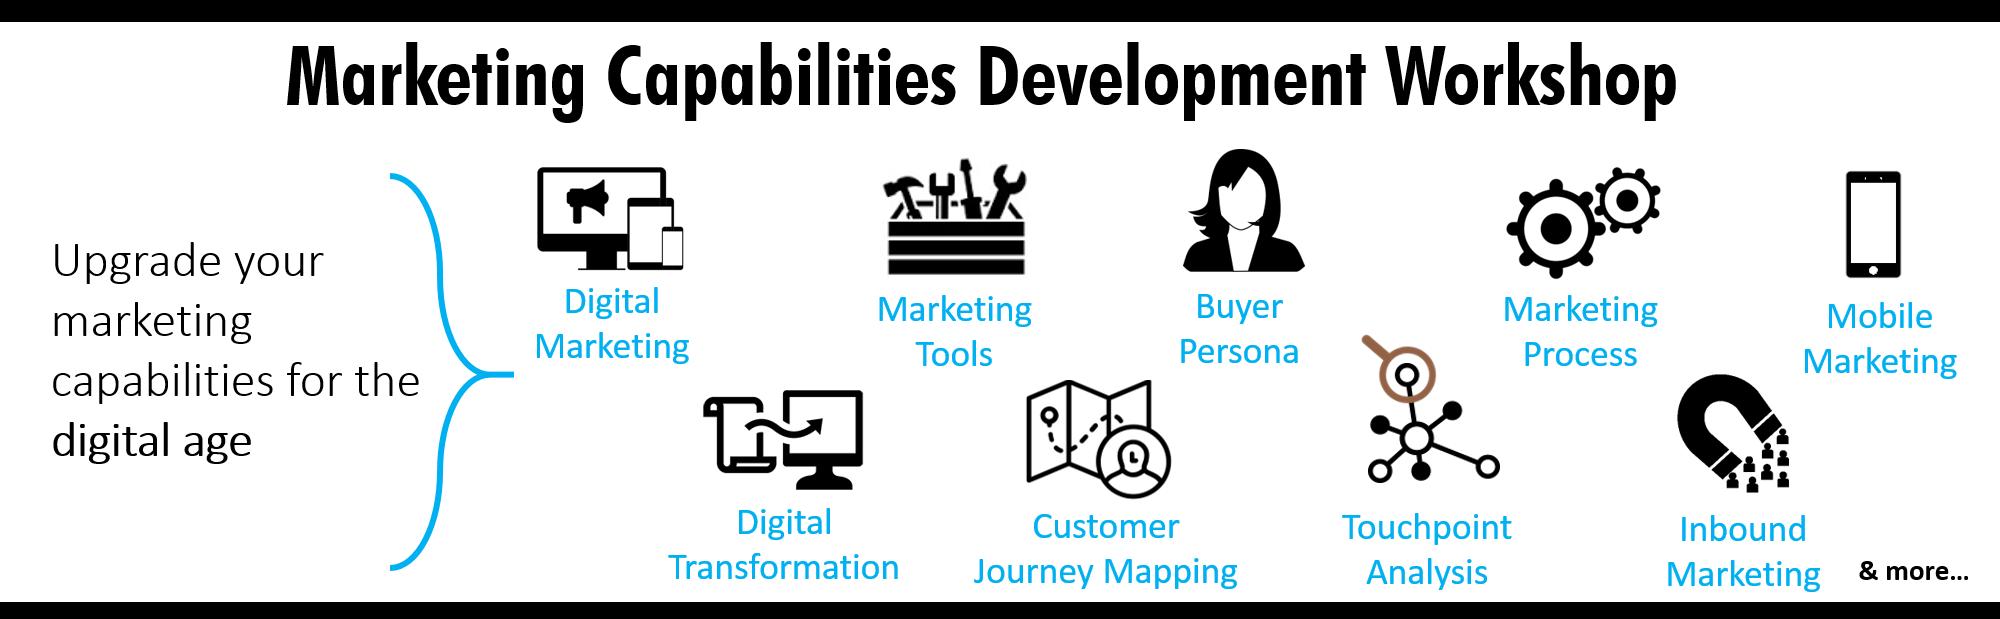 Marketing Capabilities Development Workshop